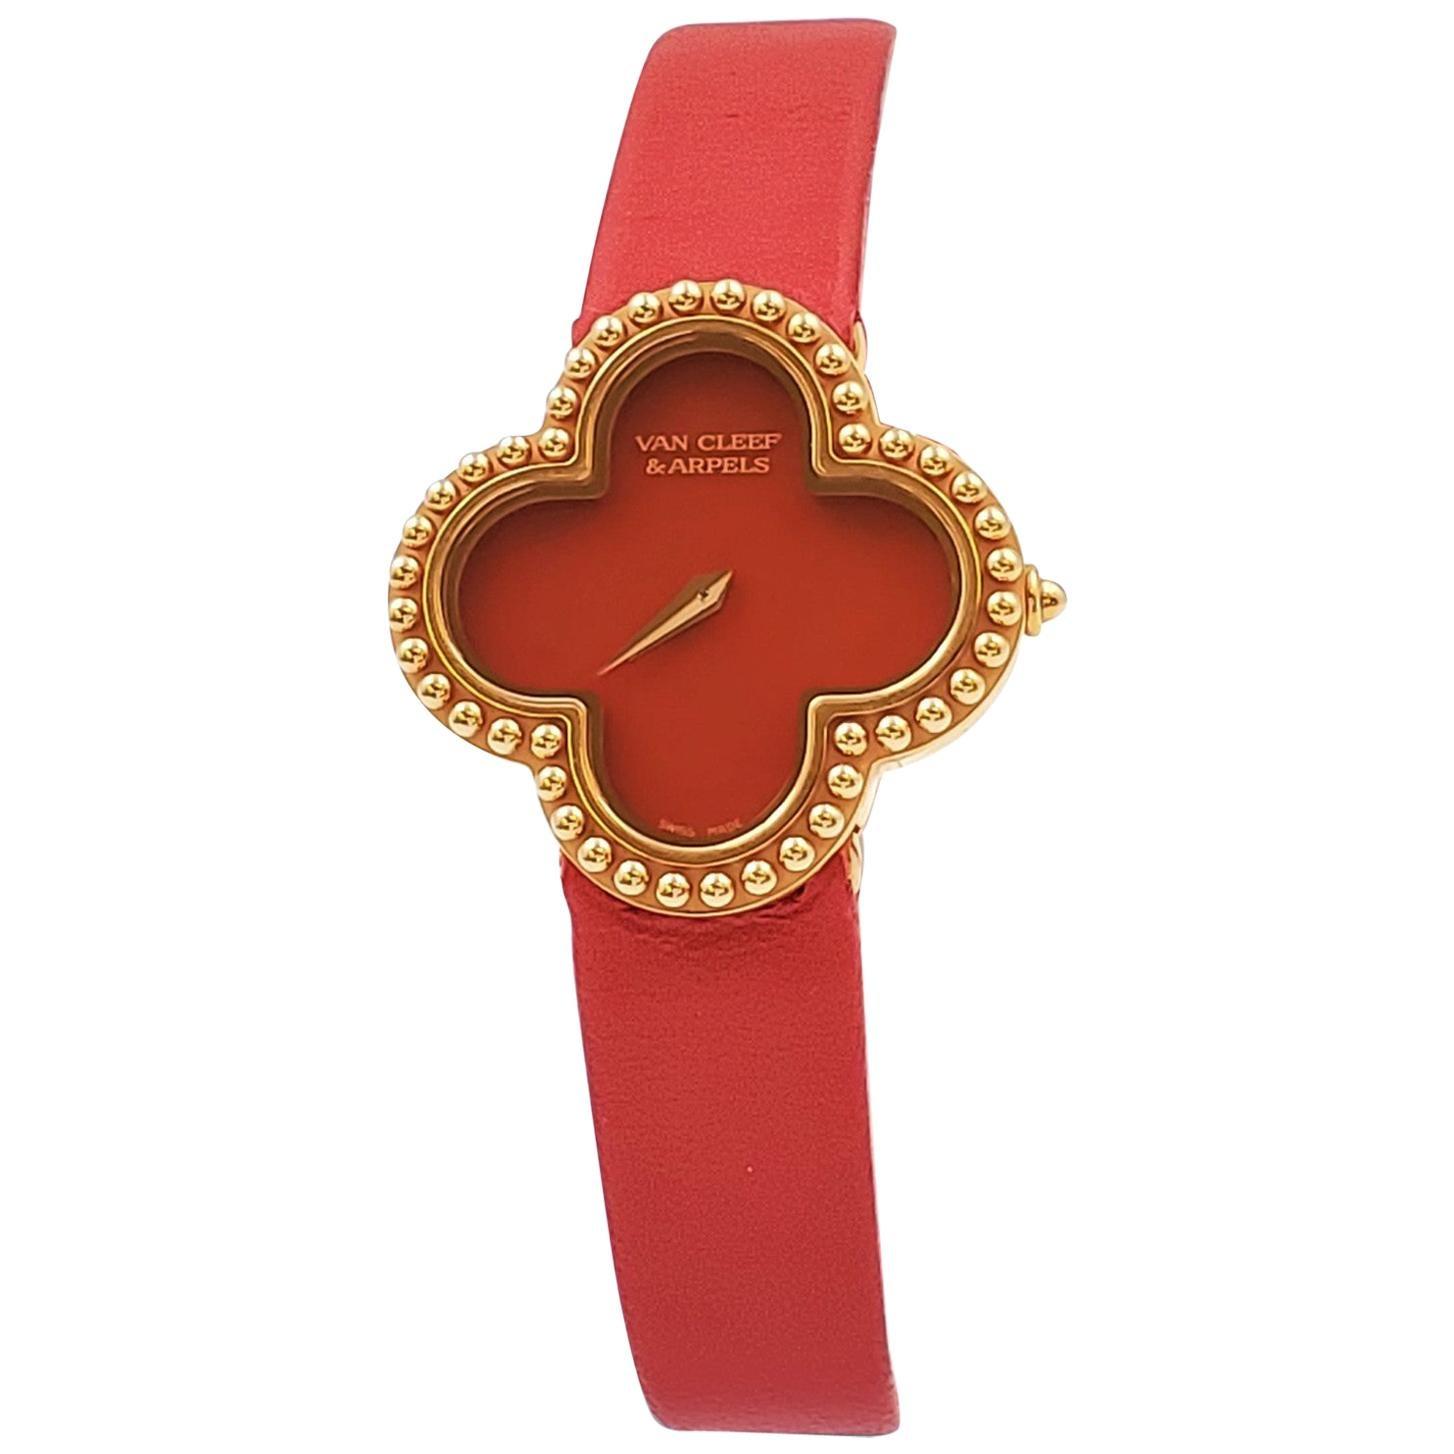 Van Cleef & Arpels 'Alhambra' Carnelian Dial Watch, Small Model